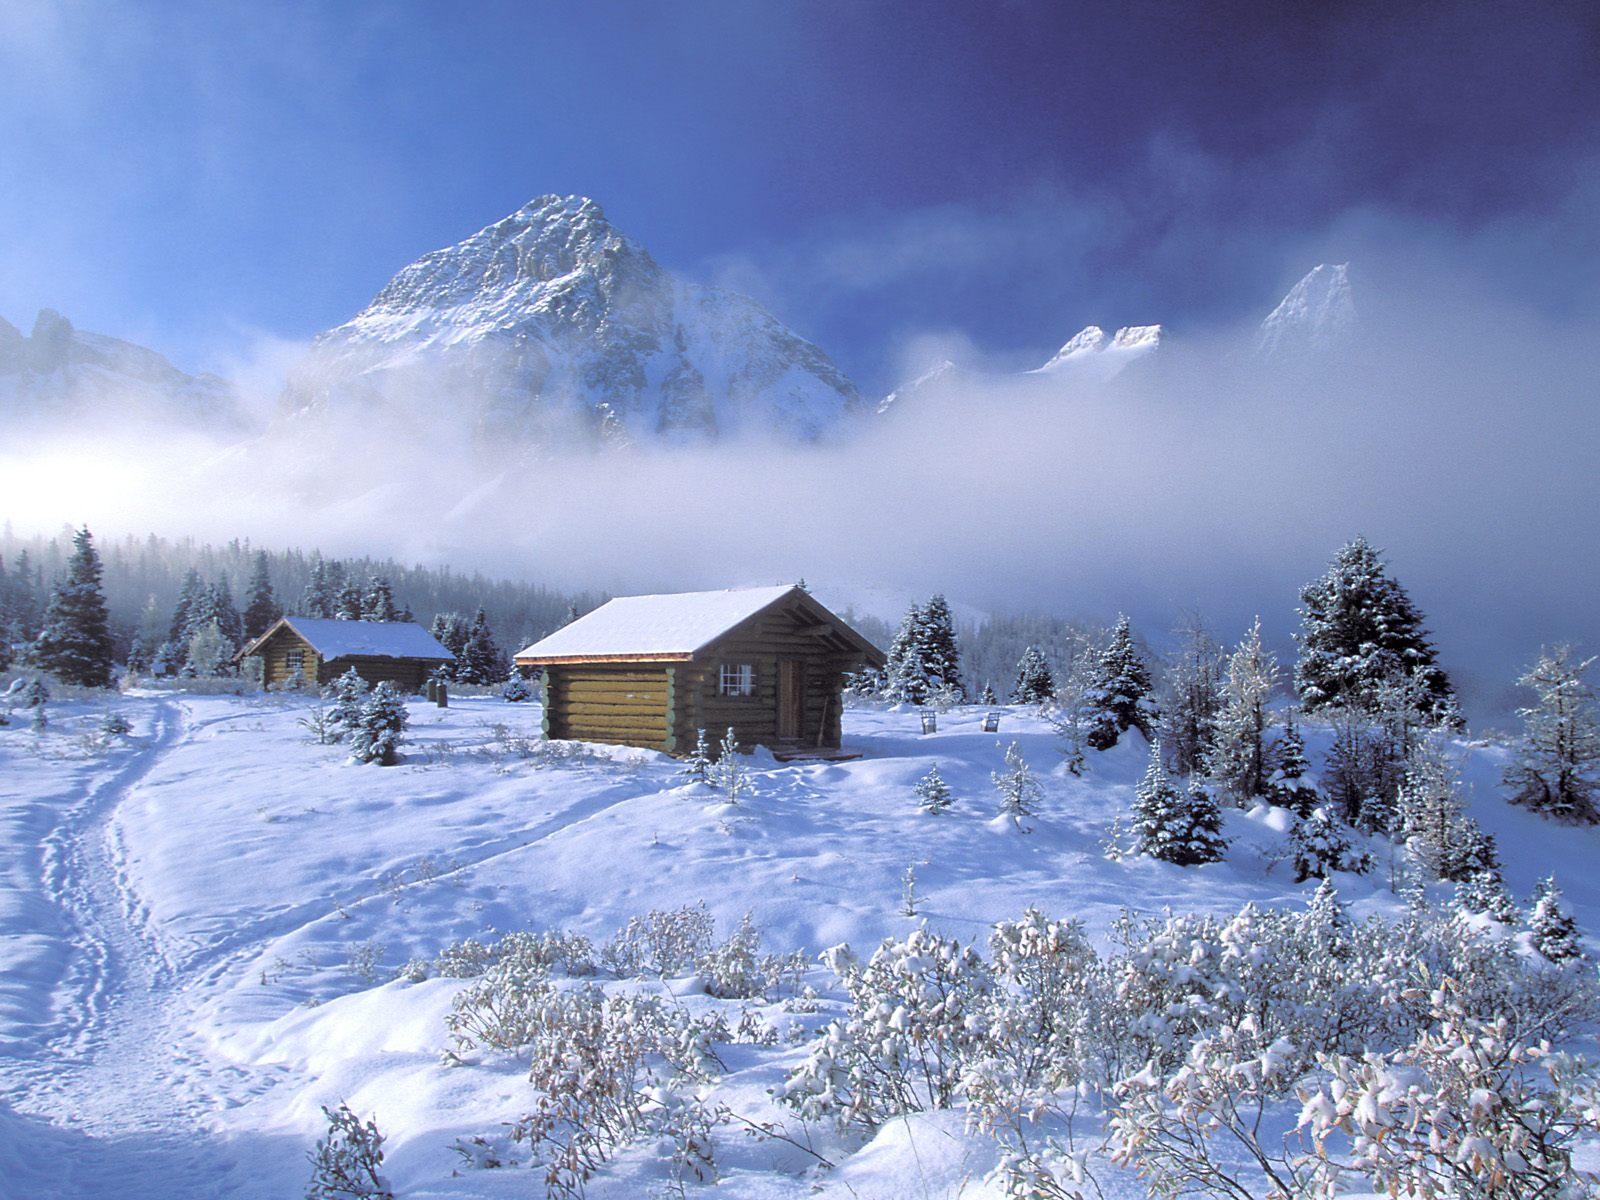 winter 108 hintergrundbild gratis - photo #23